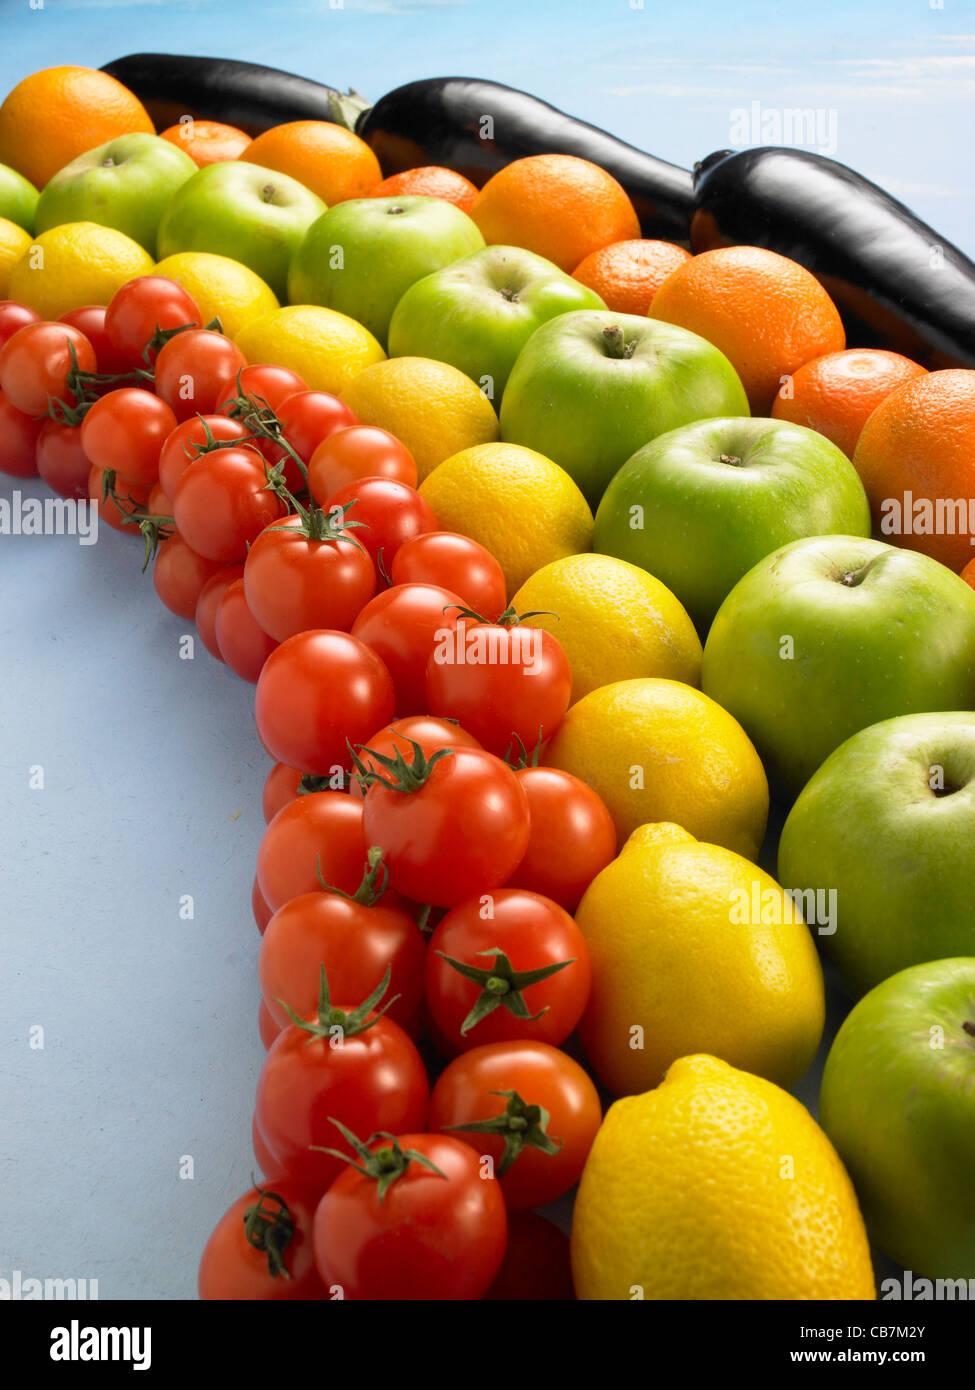 Tomatoes,lemons,green apples,Oranges, Aubergines - Stock Image